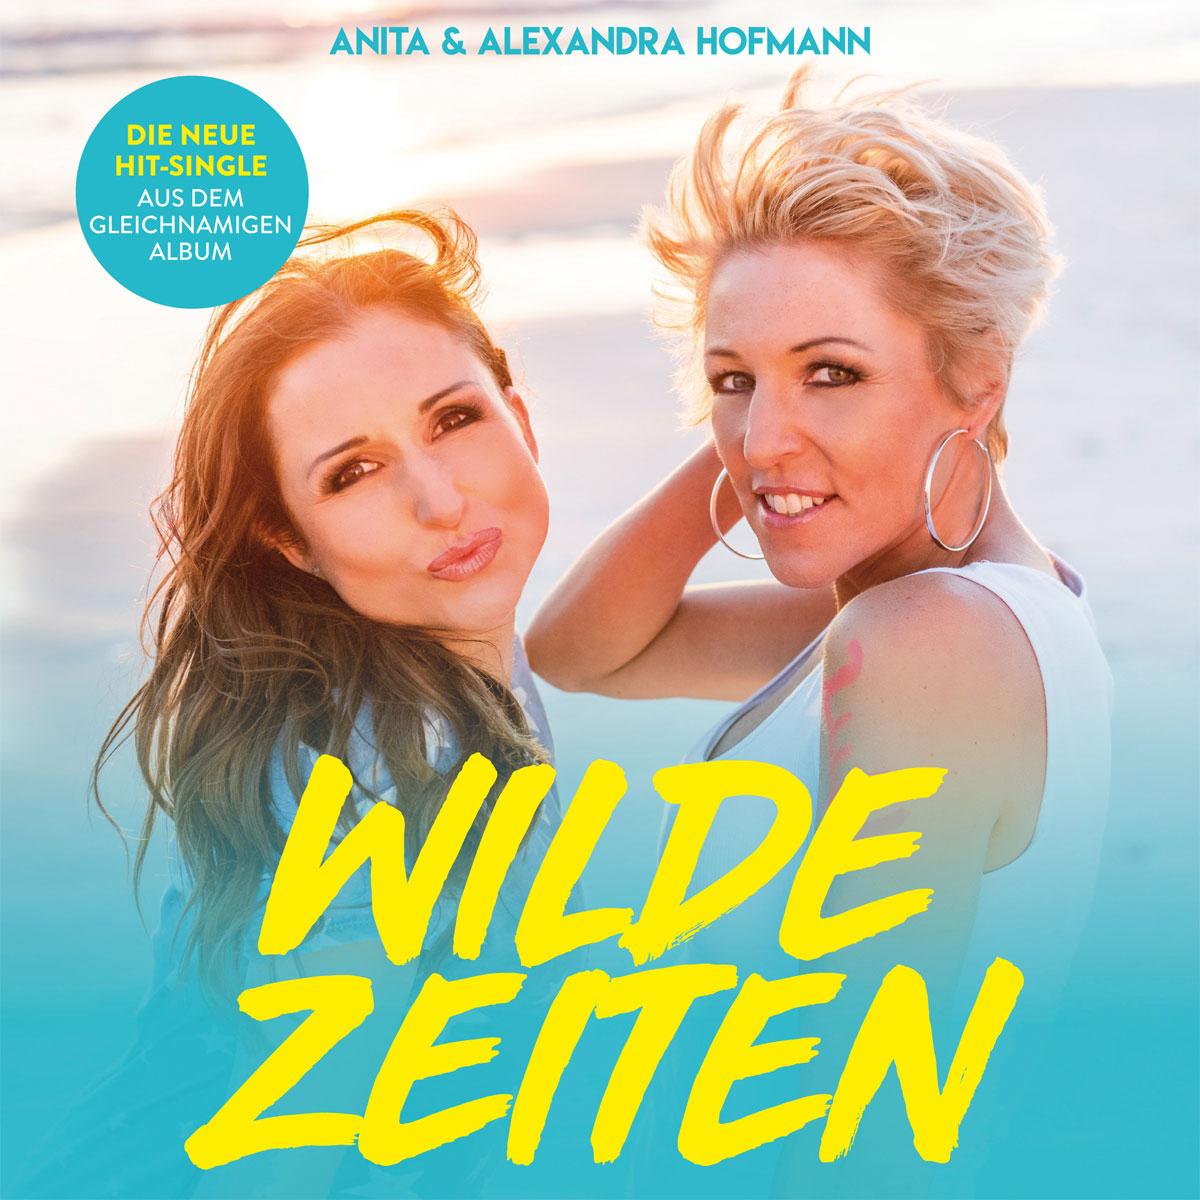 WILDE ZEITEN (SINGLE)